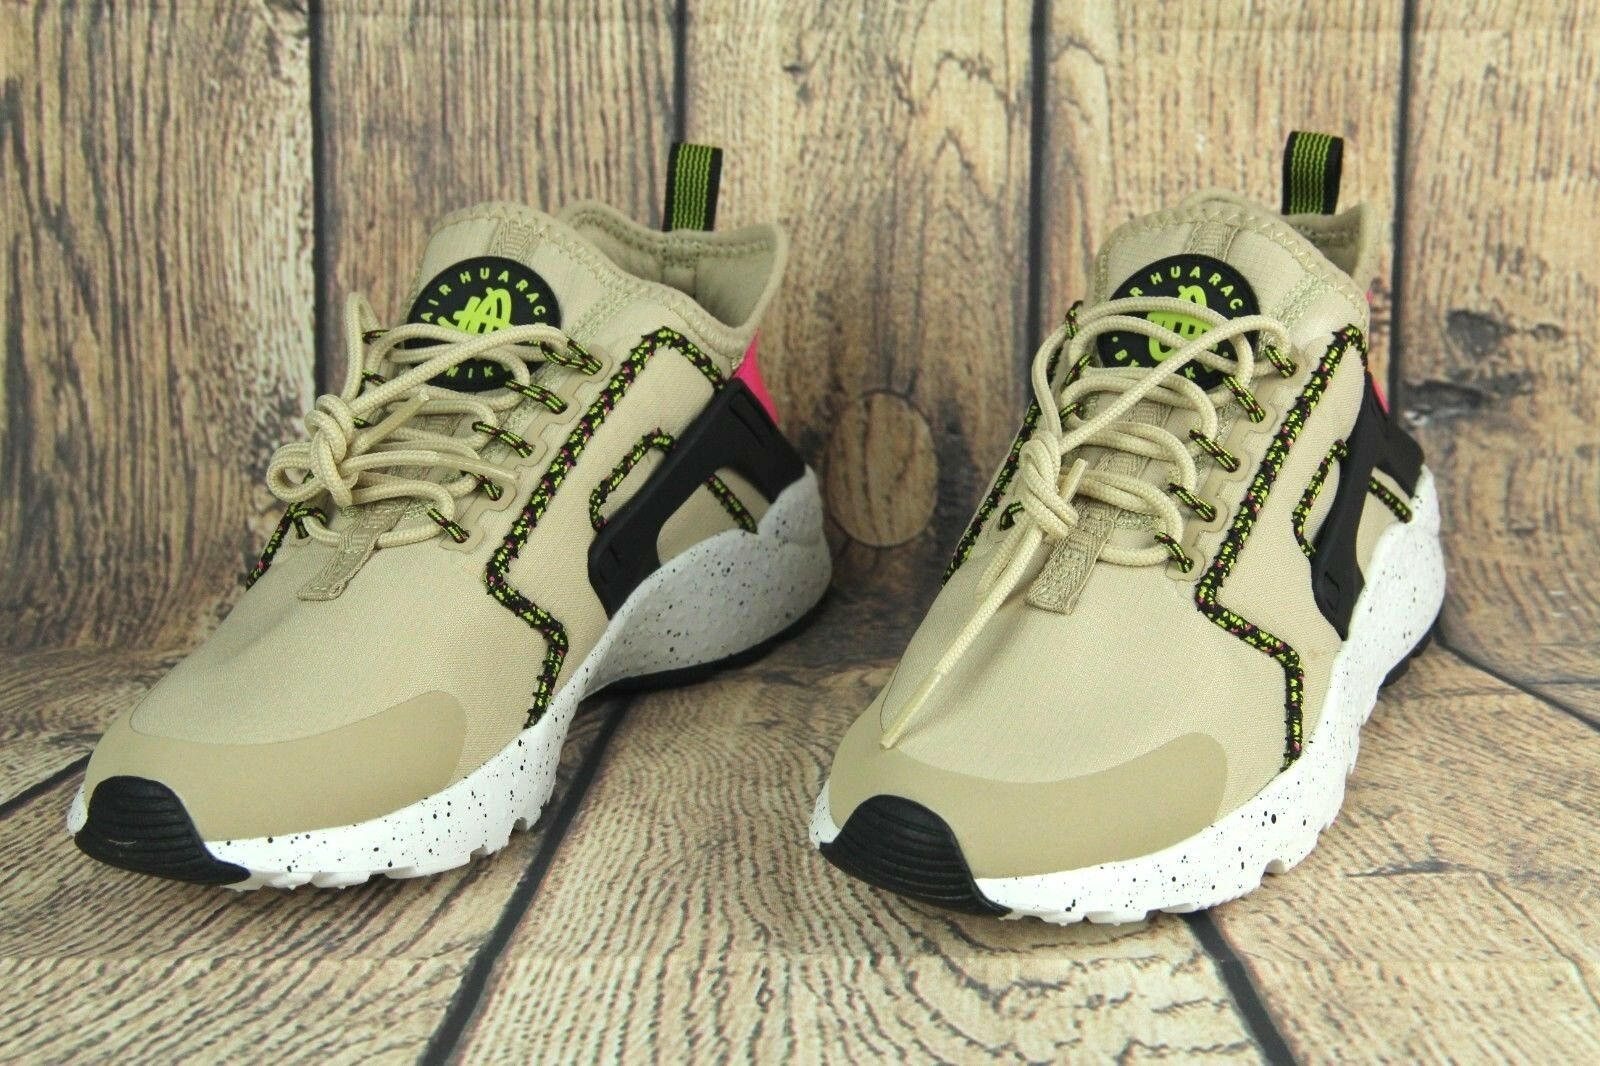 Nike Air Huarache Run Ultra SI SZ Running Shoes Mushroom Black 881100-200 WMNS SZ SI 7 4b30df